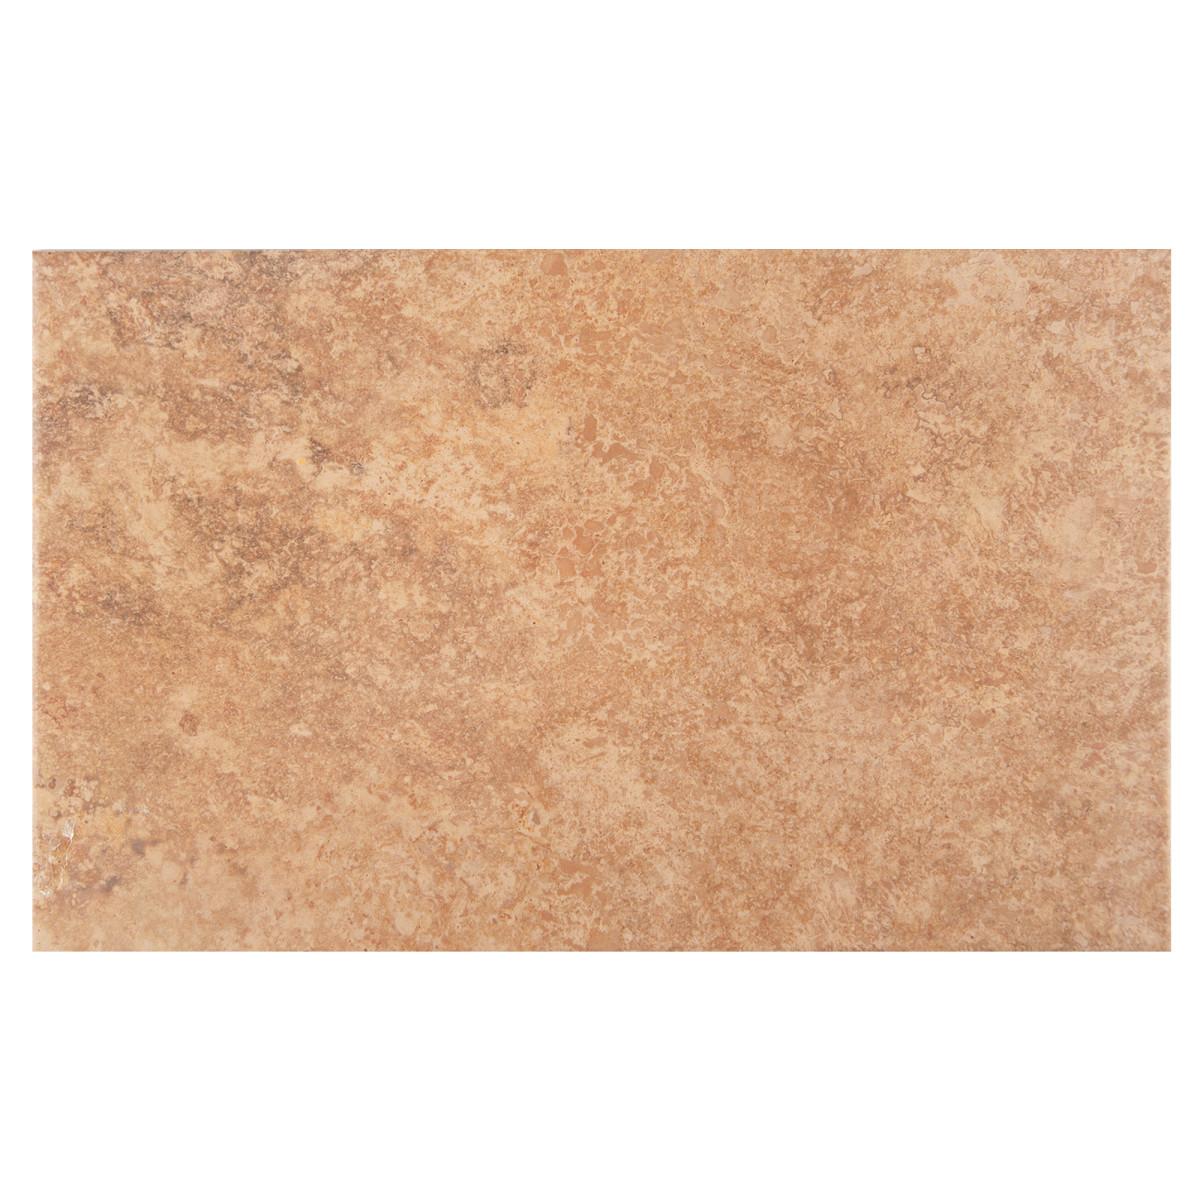 Плитка настенная Piemonte 25х40 см 1.4 м2 цвет бежевый